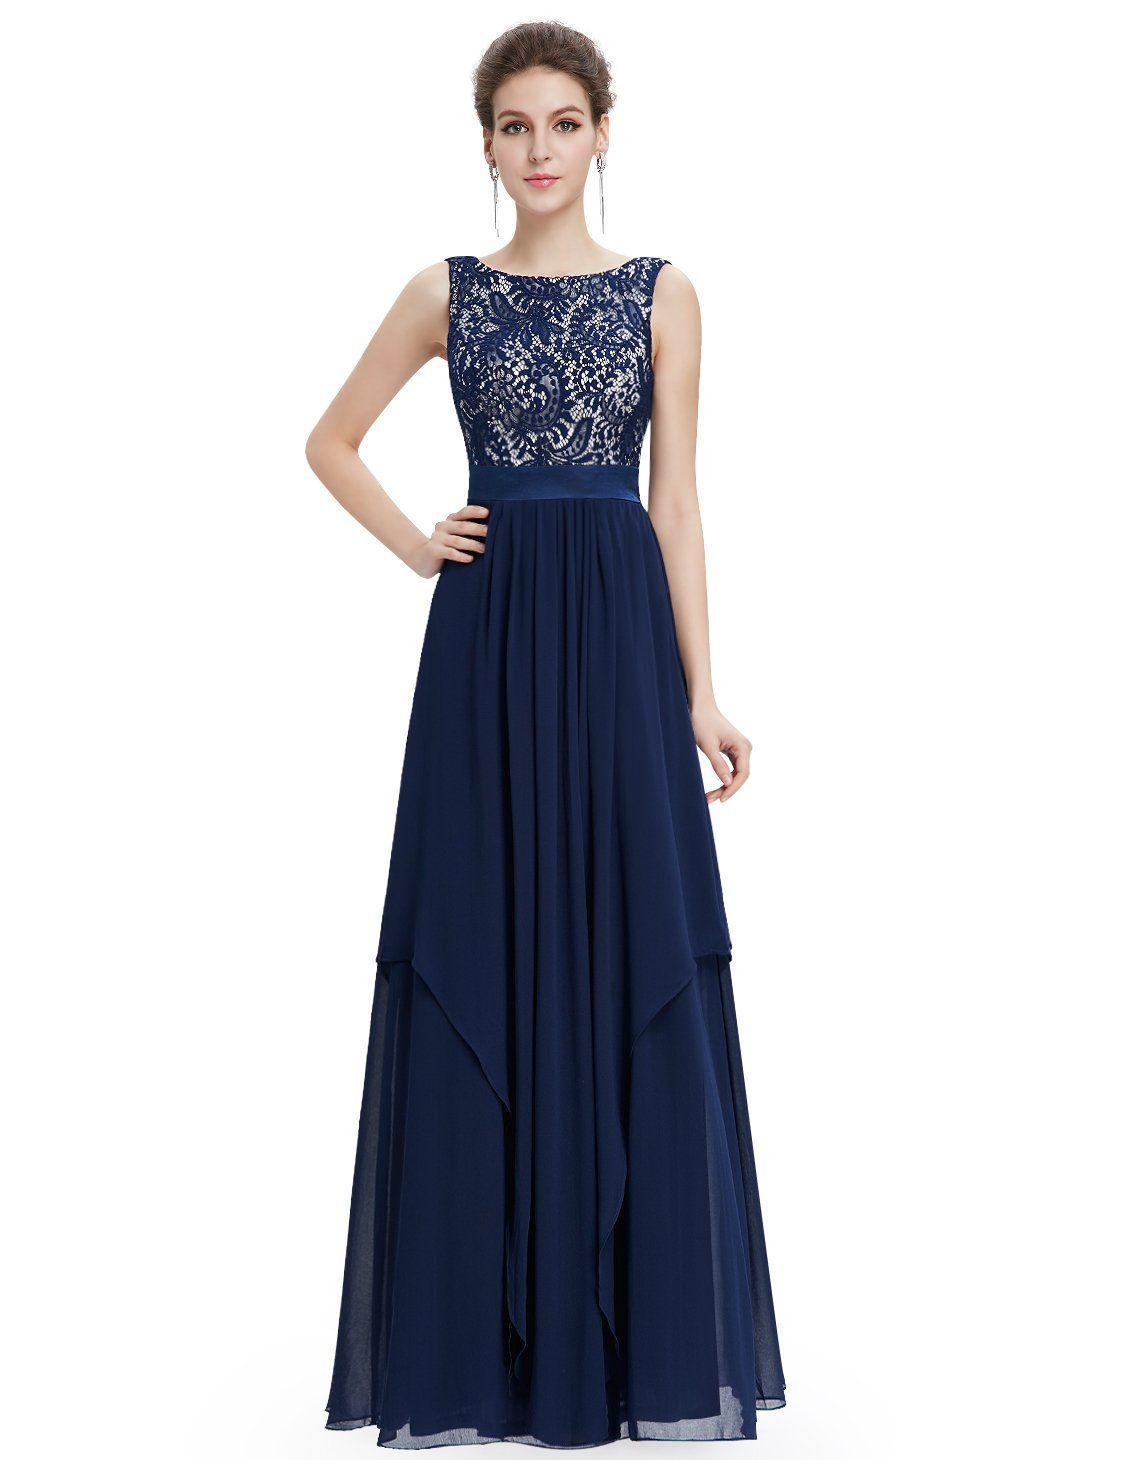 Amazon.com: Ever Pretty Elegant Sleeveless Round Neck Evening Party ...